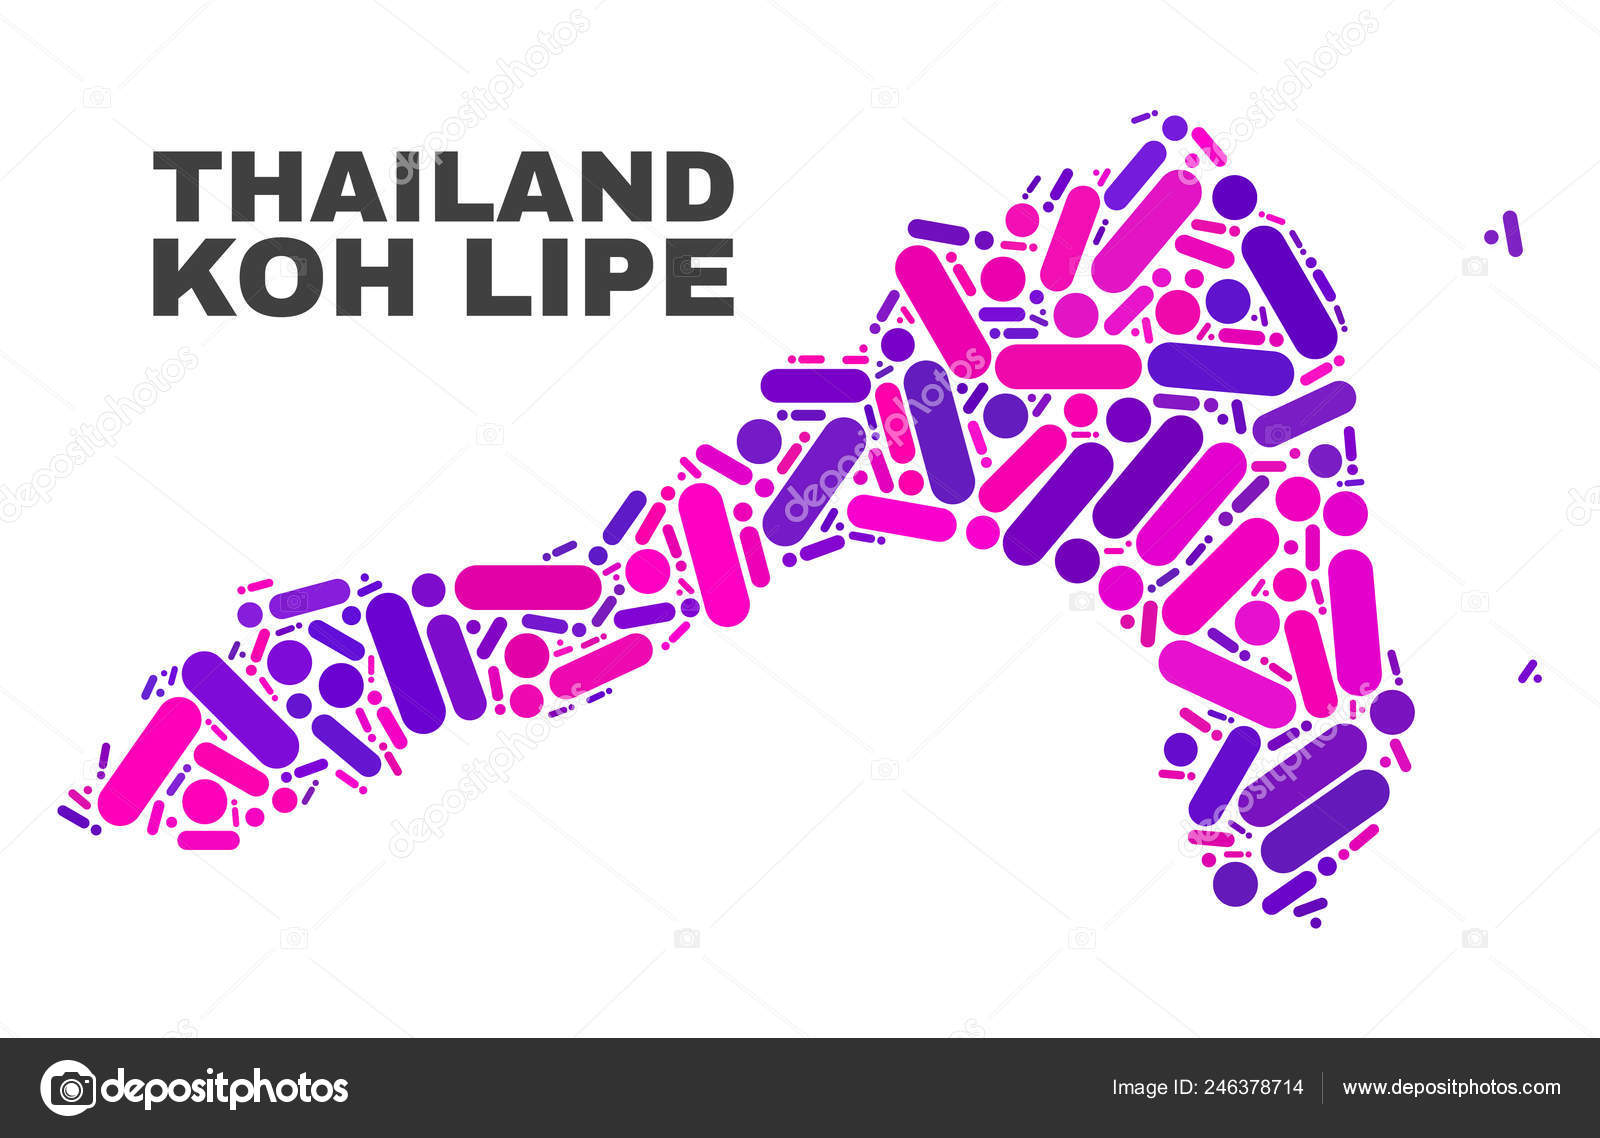 Mosaic Koh Lipe Map of Dots and Lines — Stock Vector ... on koh samui map, curitiba map, johor bahru map, national parks thailand map, tarutao national park, ko poda, koh tao map, gdansk map, chichicastenango map, ho chi minh city map, koh jum map, krabi province, kisumu map, ao nang map, phi phi islands, albufeira map, isla mujeres map, lecce map, chiang rai map, alajuela map, klagenfurt map, coimbra map, chiang mai map, langkawi map,